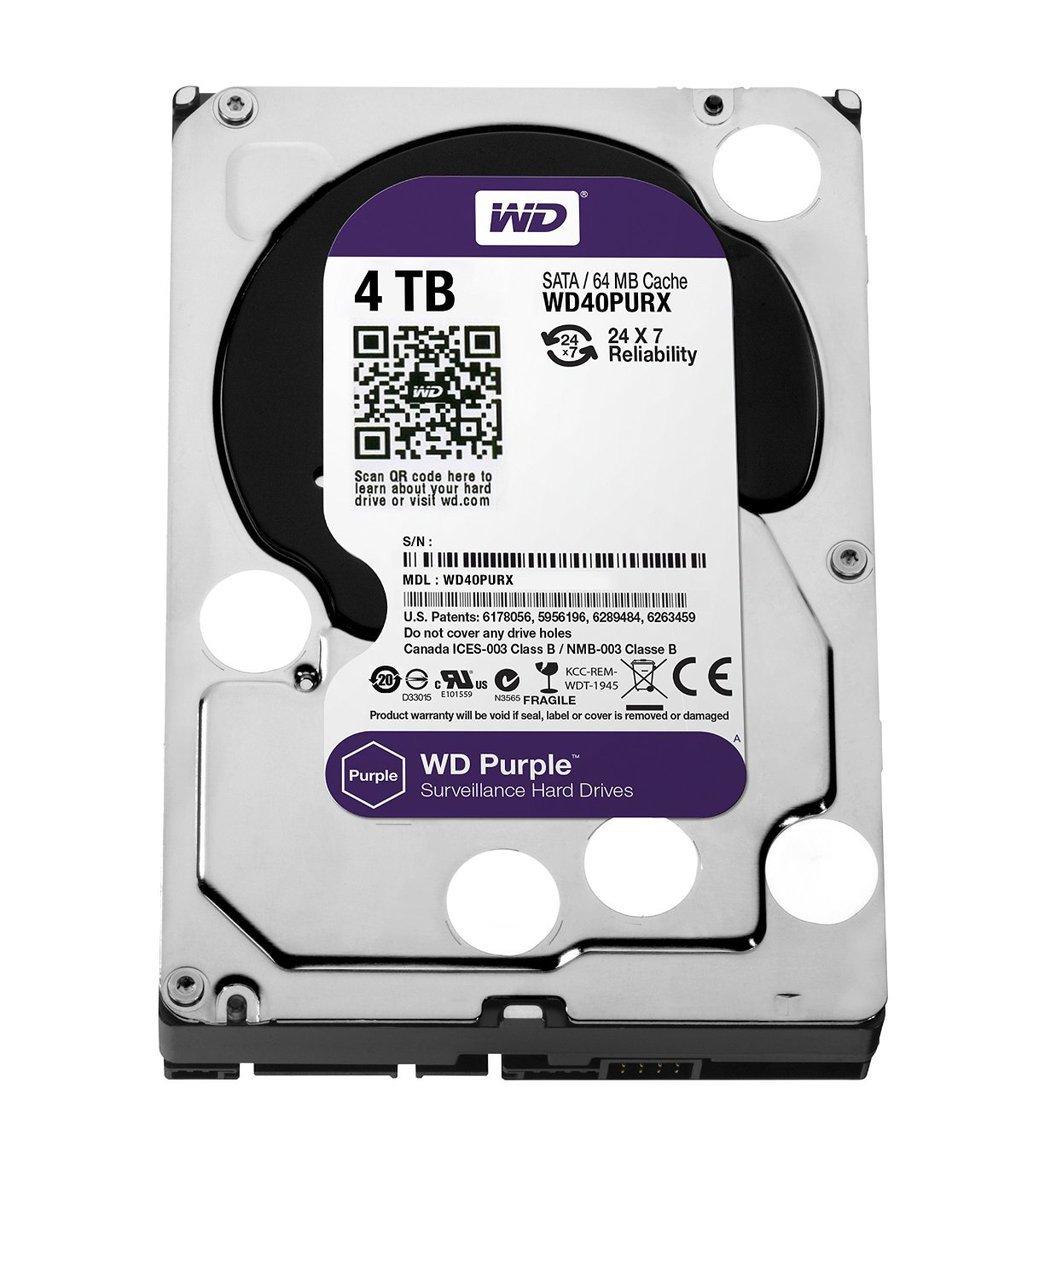 WD Purple 4TB Surveillence Hard Drive: 1 to 8-bay: 3.5-inch, SATA 6 Gb/s, Intellipower, 64MB Cache WD40PURX